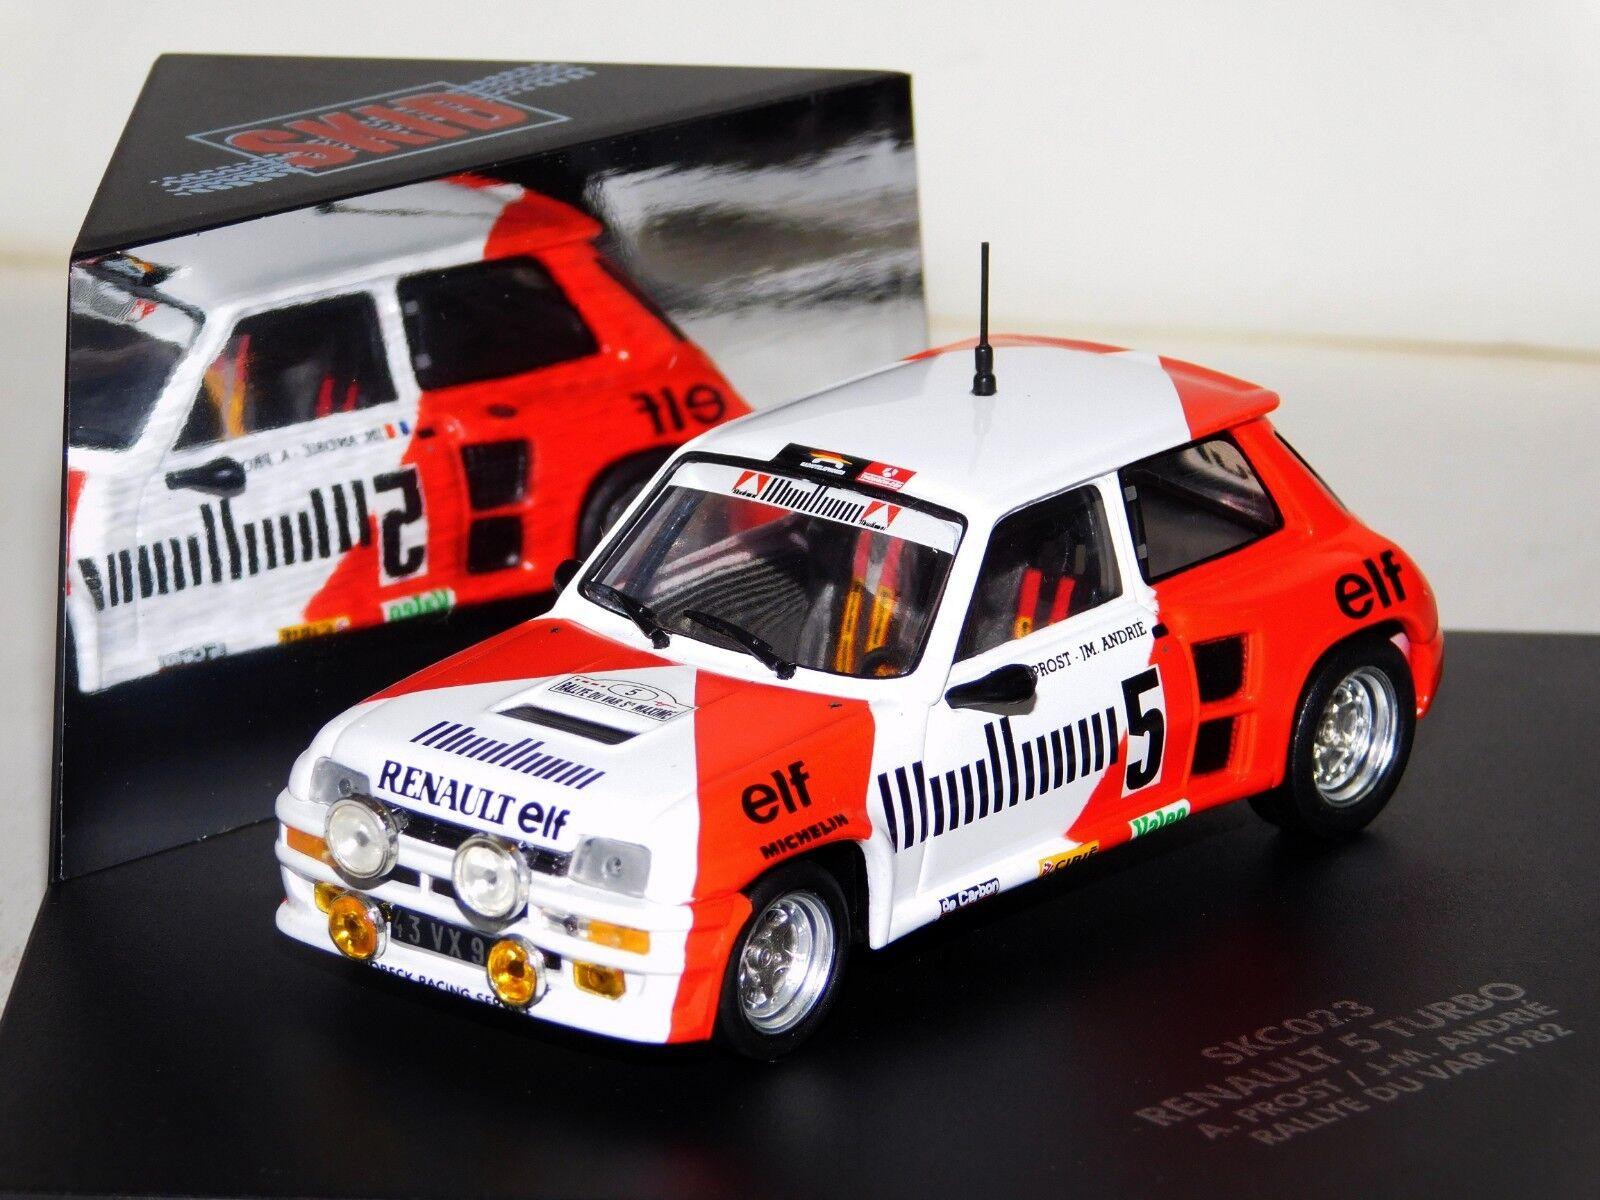 Renault 5 Turbo Rallye du Var 1982 A. Prost Prost Prost Skid SKC023 1 43 068187